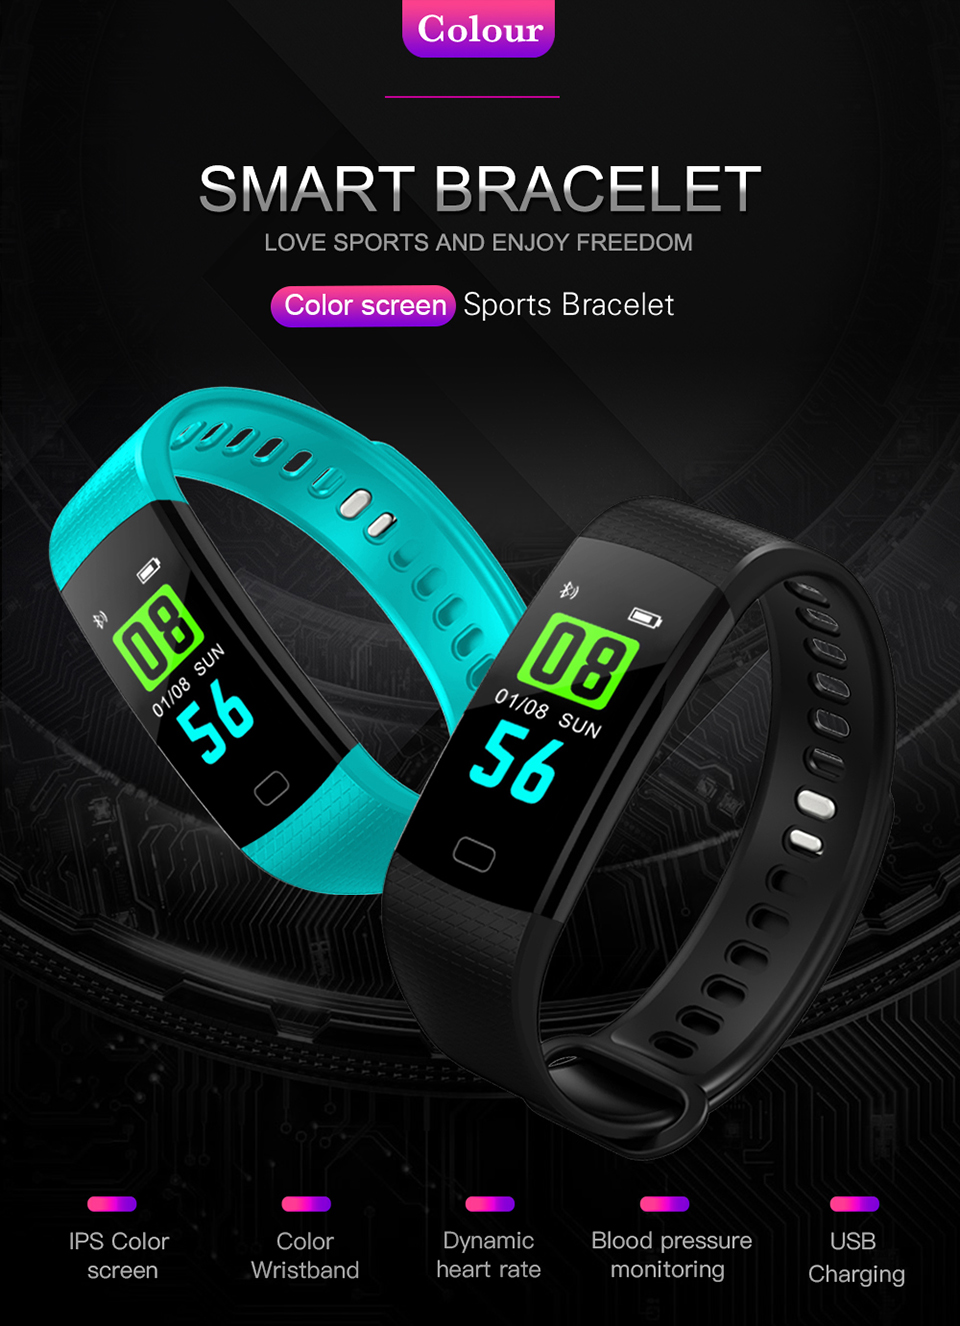 HTB1qY8YgL5TBuNjSspcq6znGFXae TimeOwner Smart Band Heart Rate Blood Pressure Monitor High Brightness Colorful Screen Smart Bracelet Wristband Notification